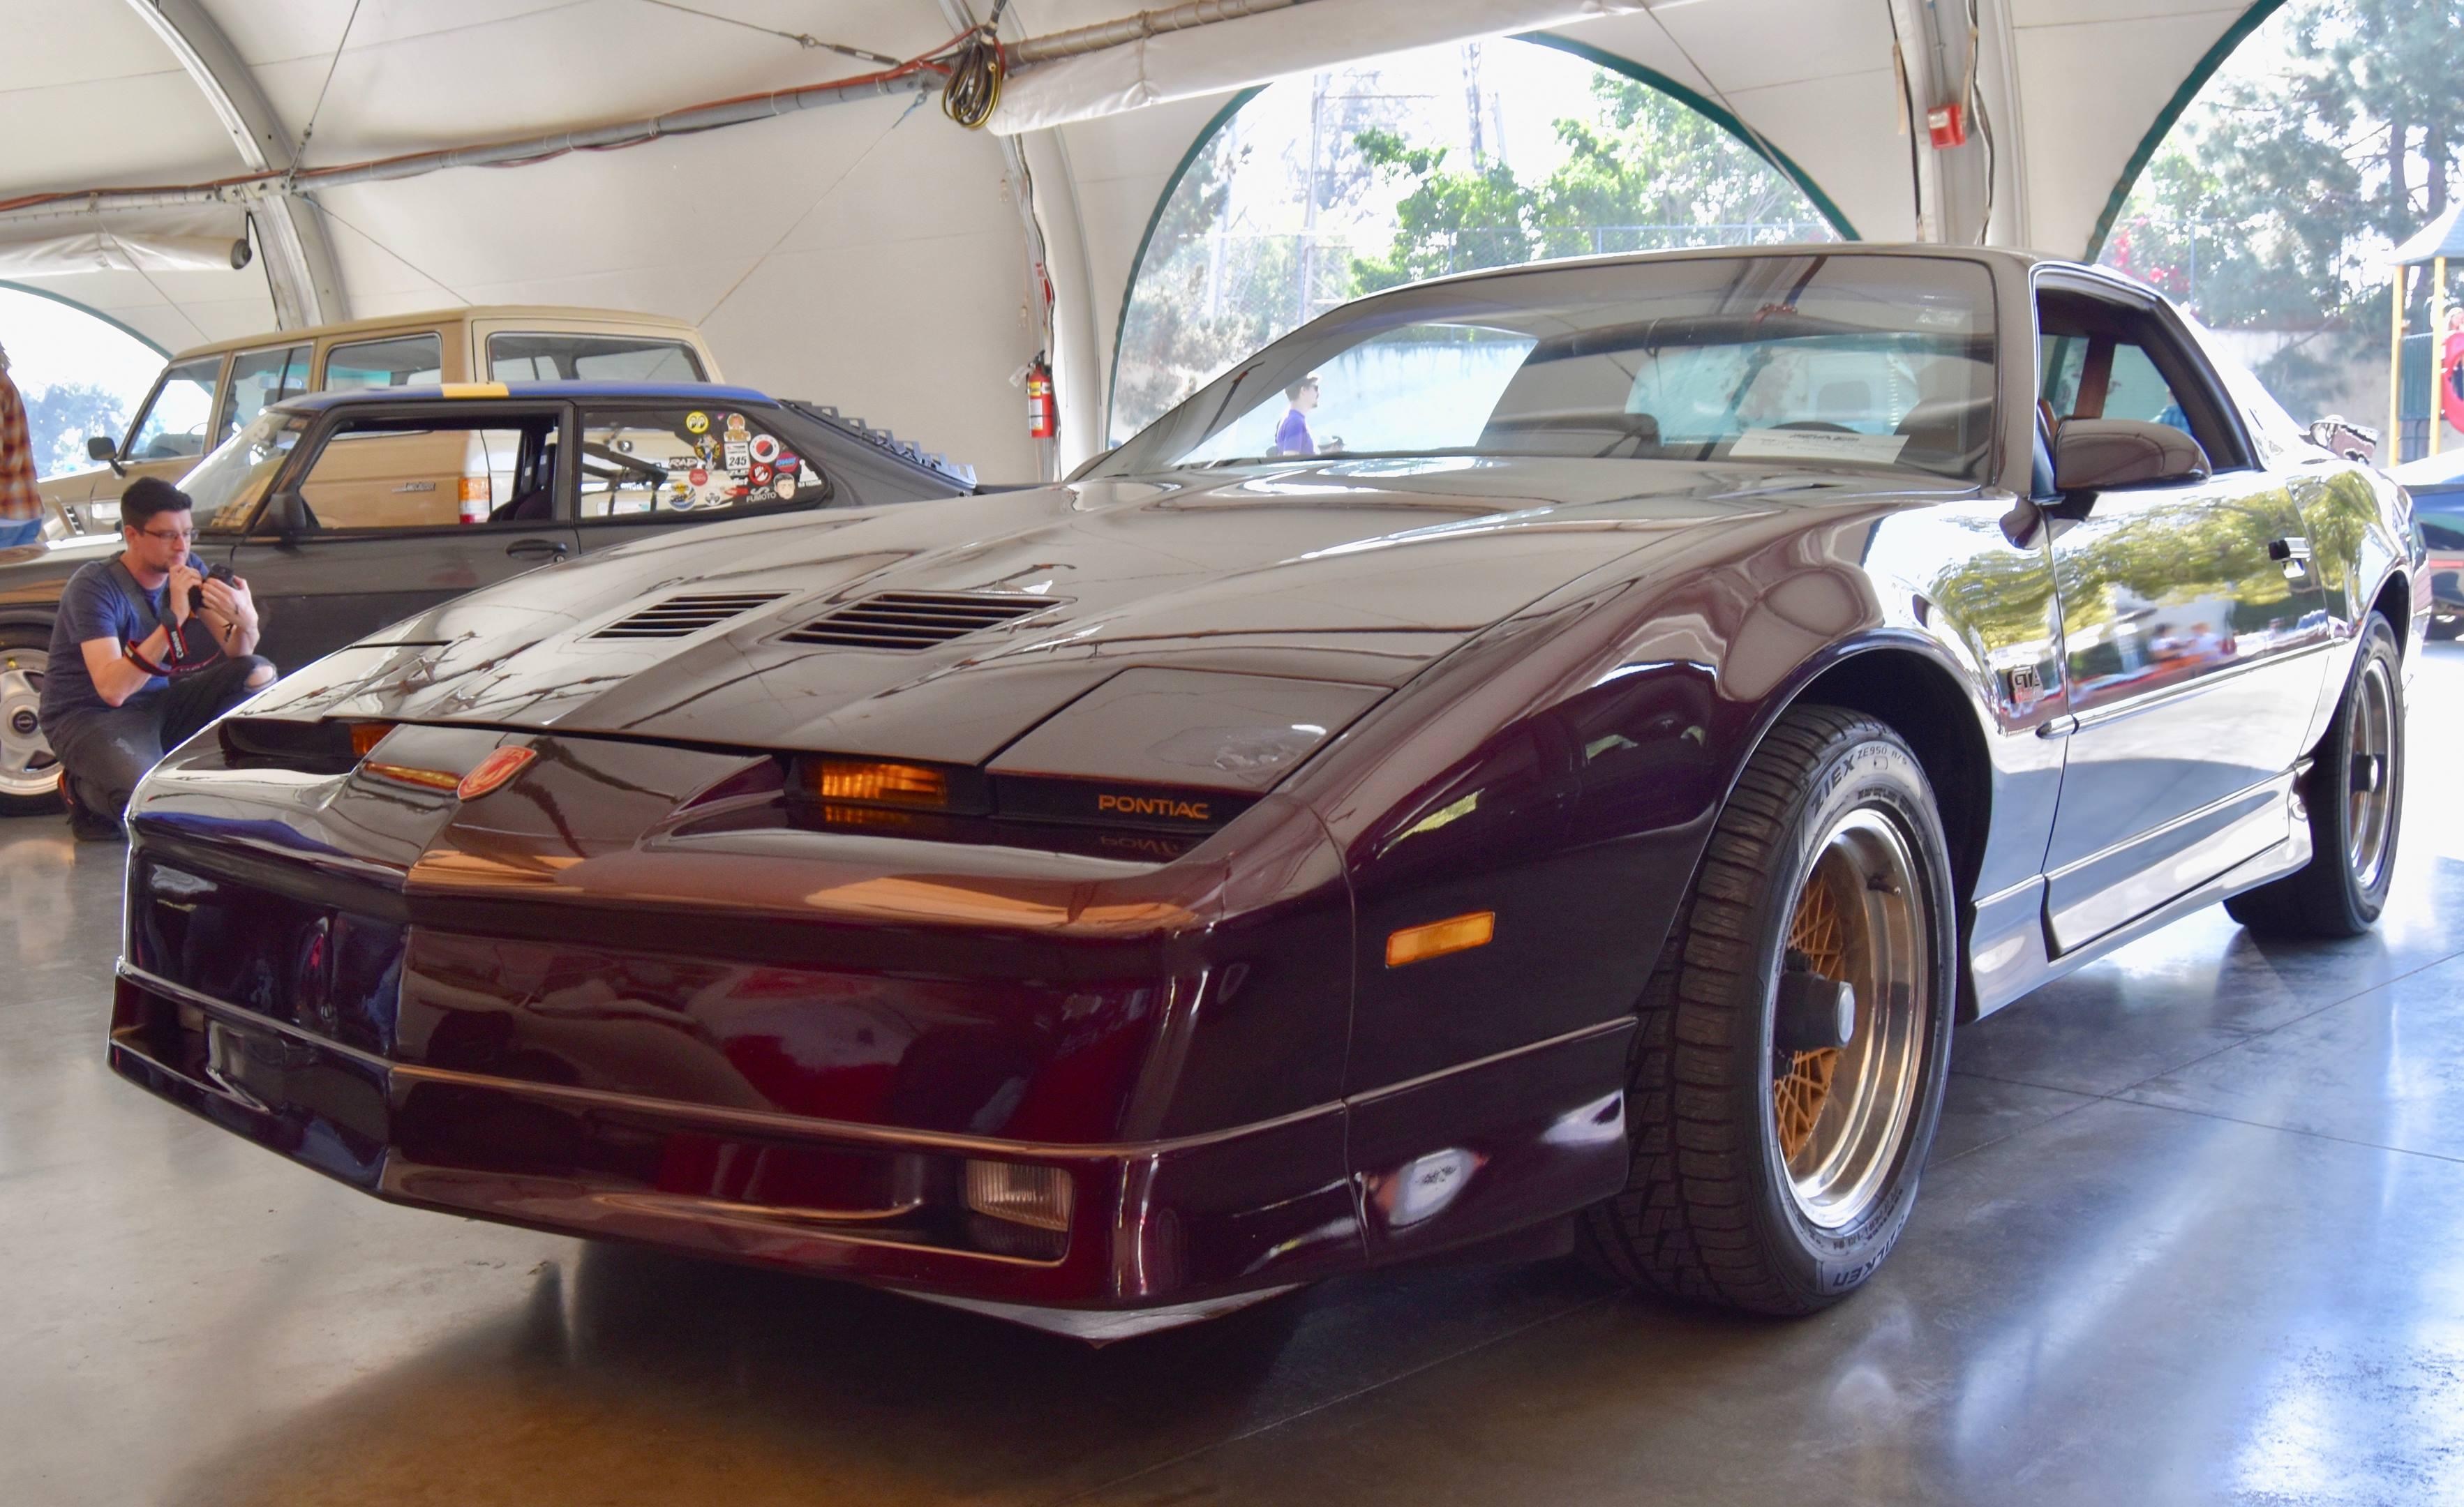 Pontiac Trans Am GTA front